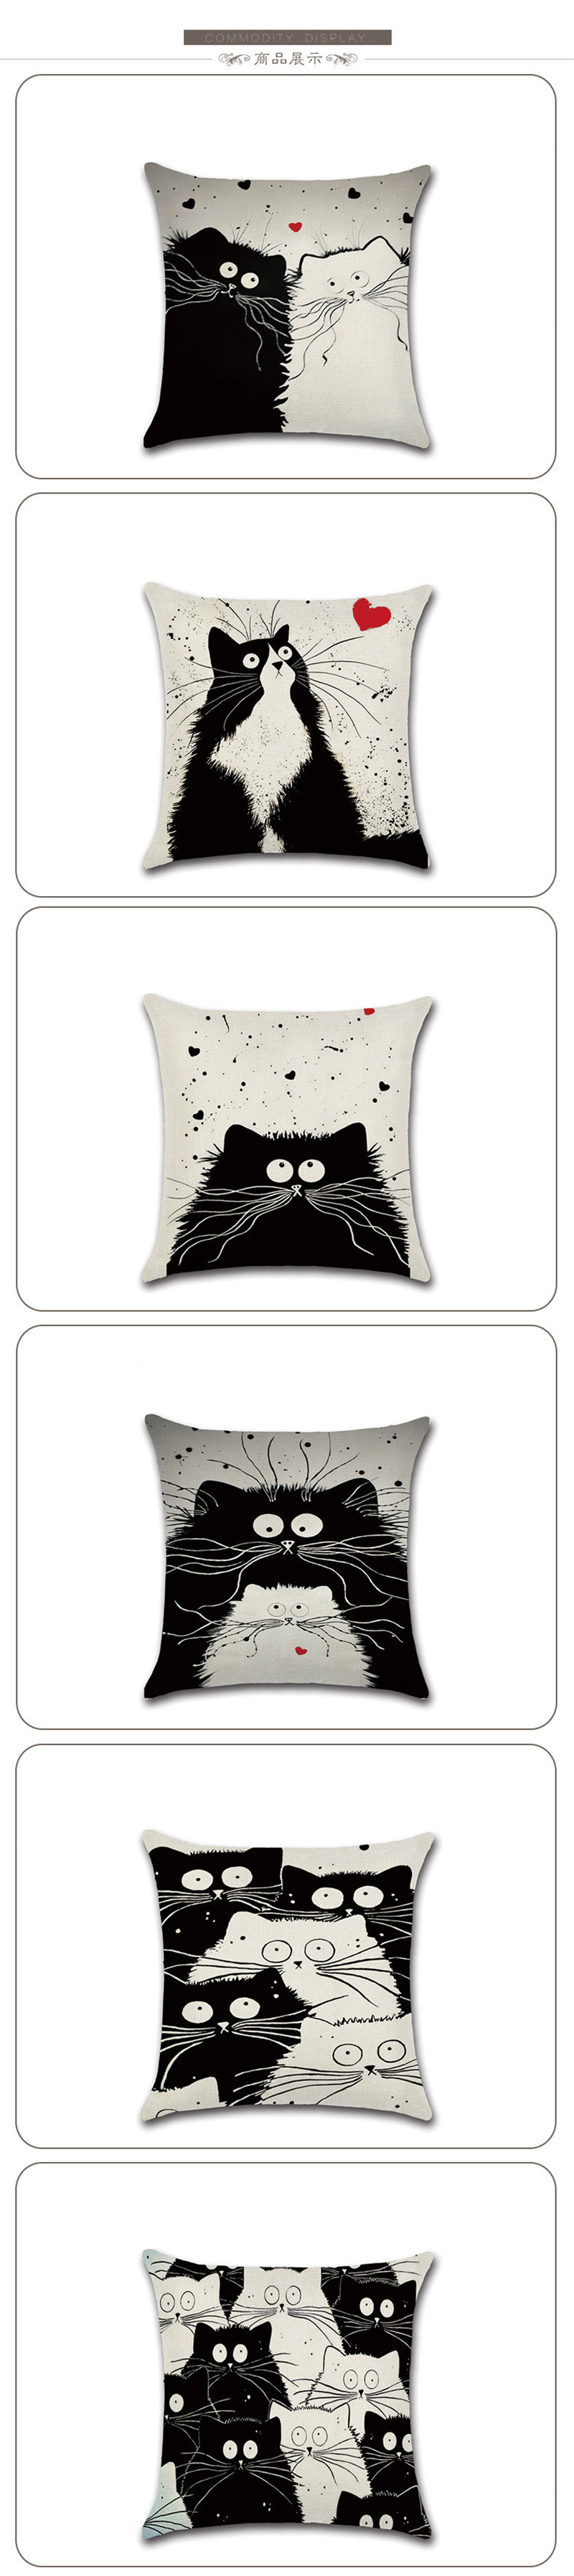 Cute Black White Cat Decorative Pillowcases